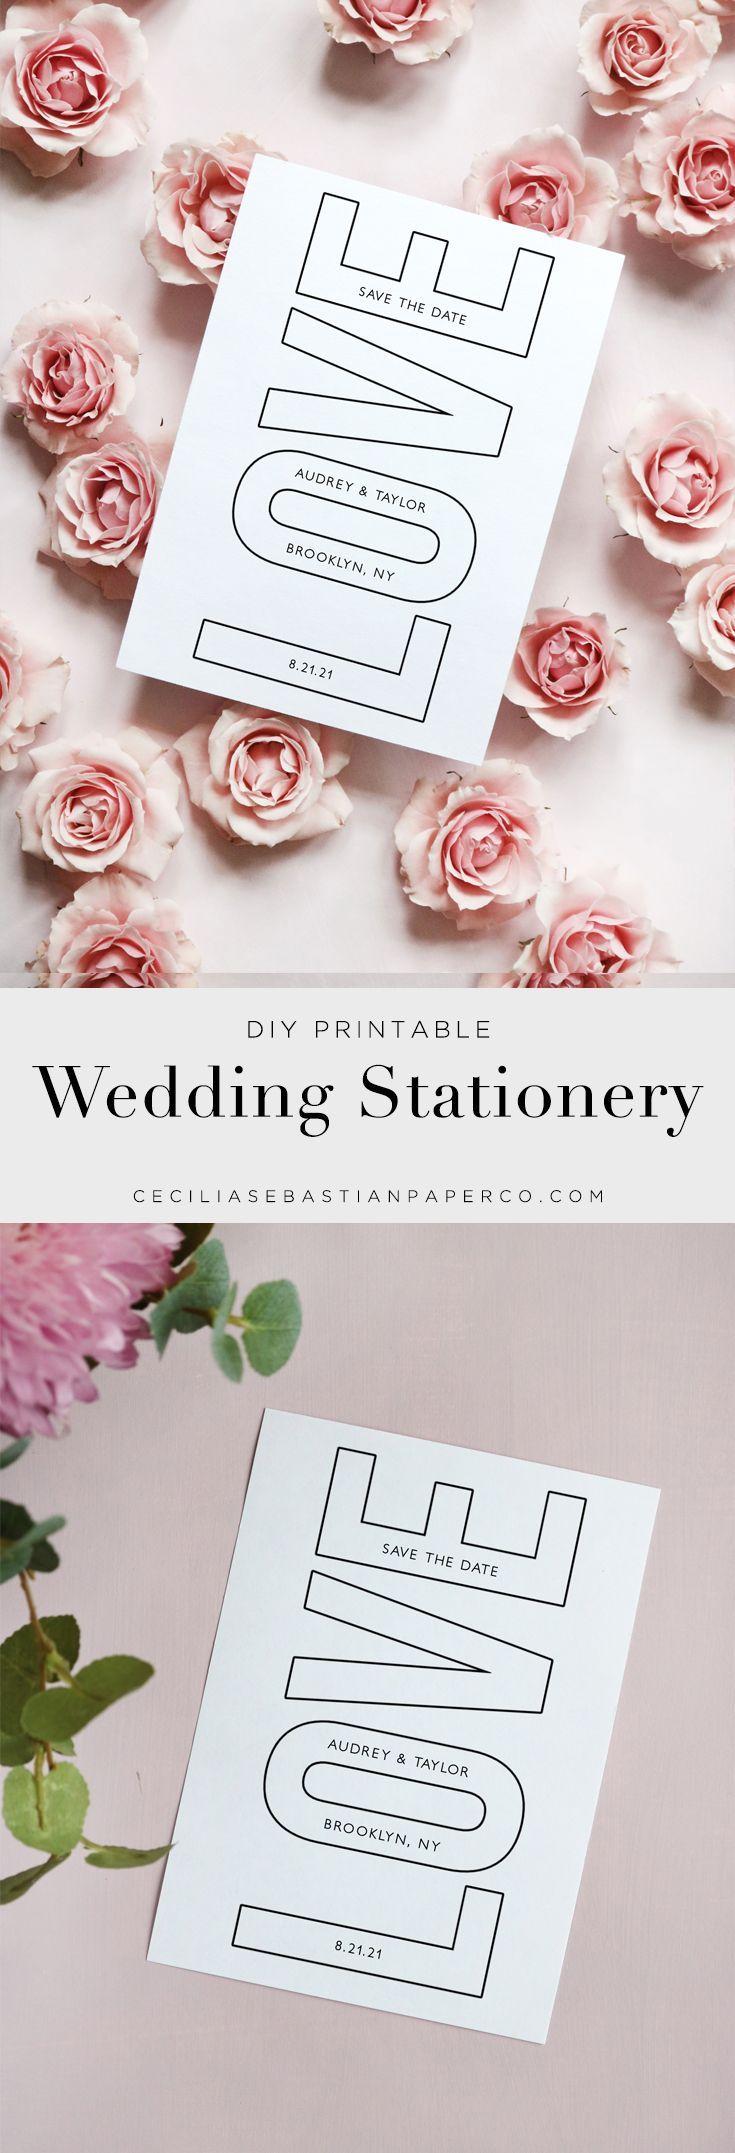 Modern Love Wedding Save the Date Template Minimal Outline Graphic Black and White Printableblack